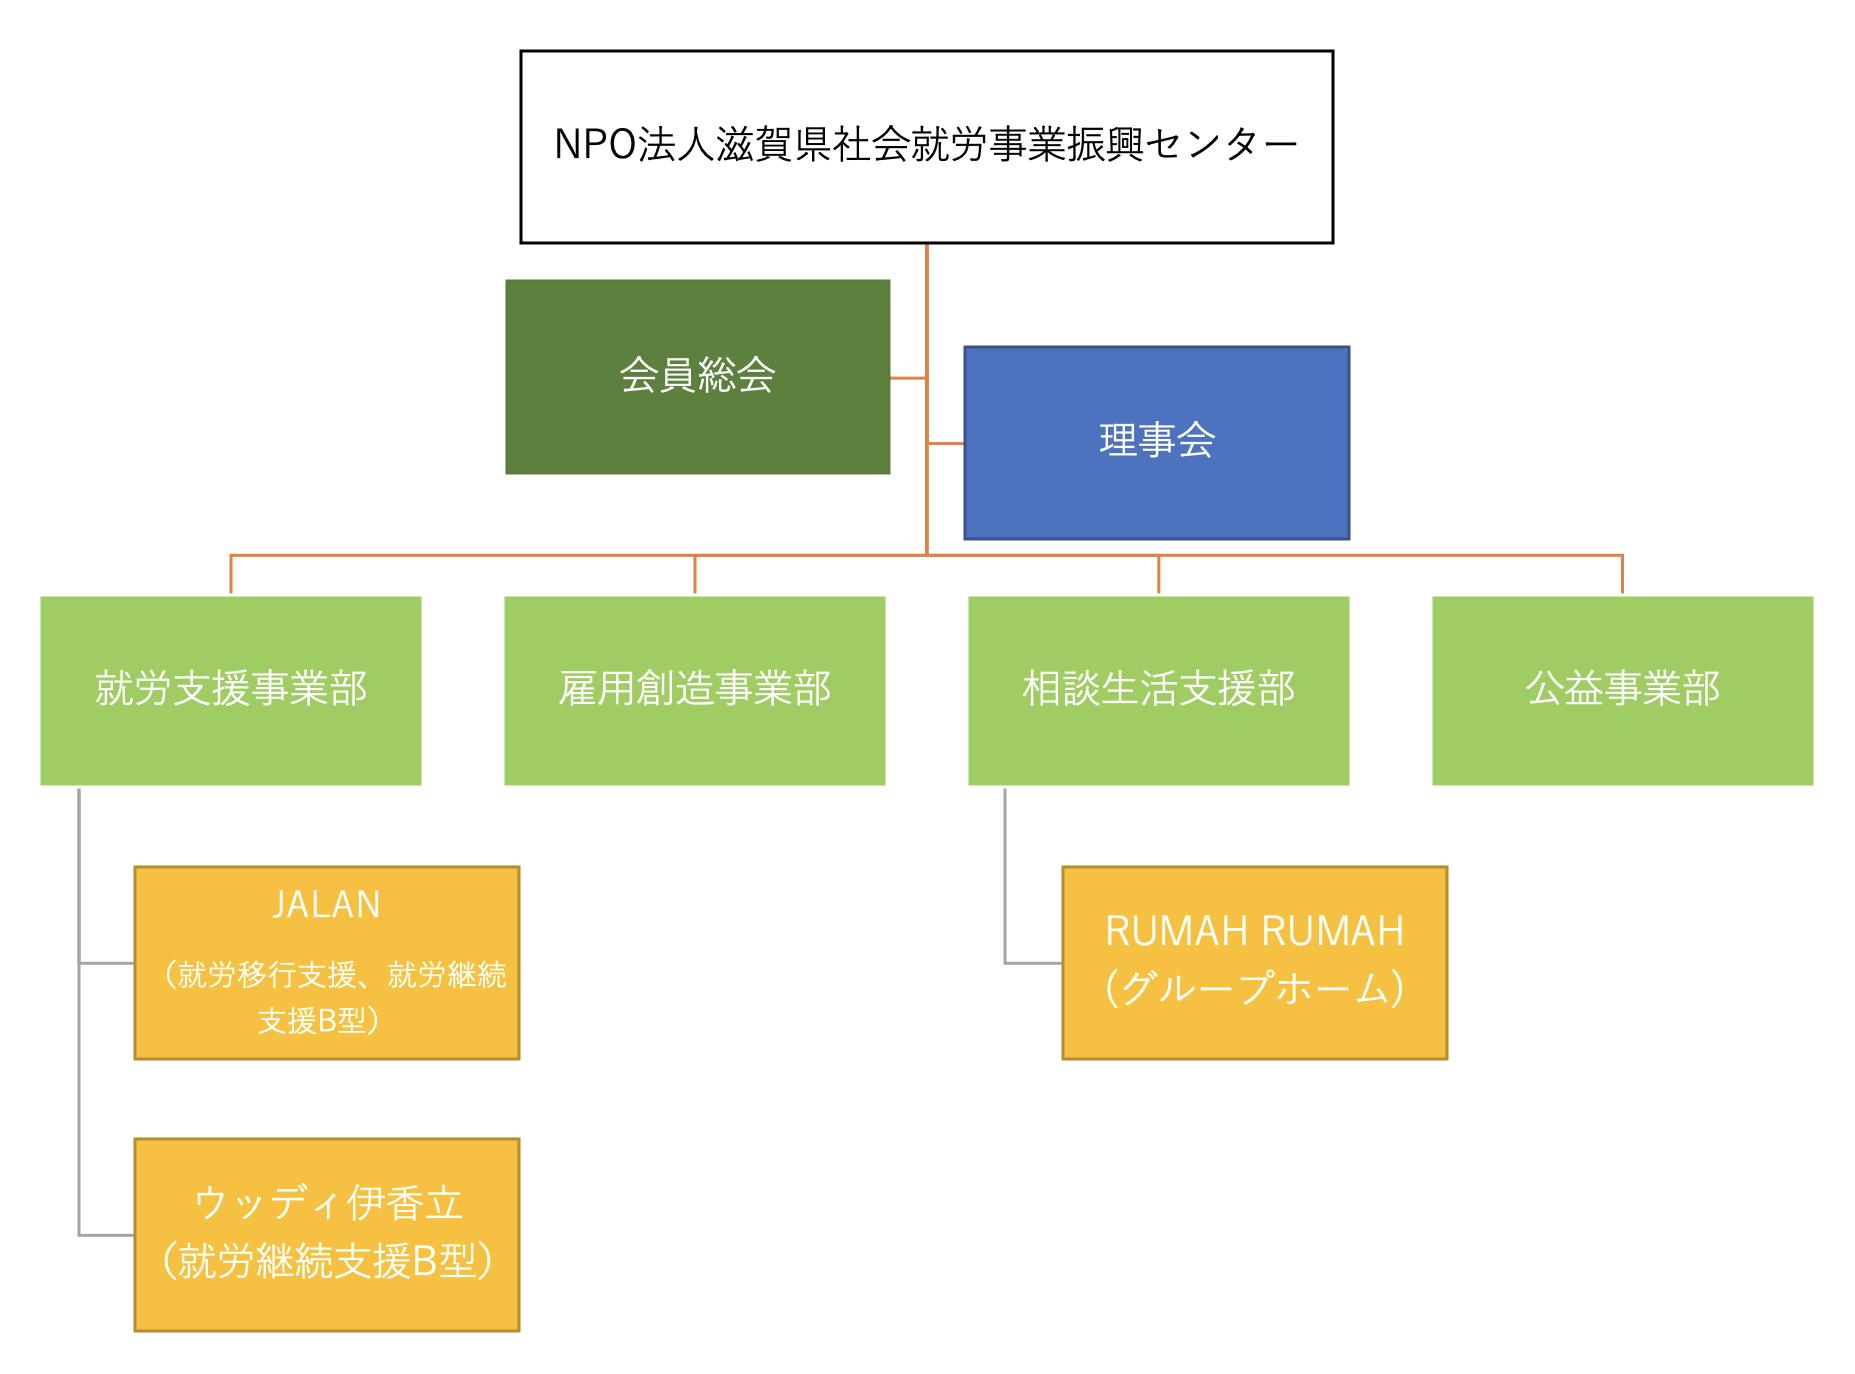 NPO法人滋賀県社会就労事業振興センターの組織図です。